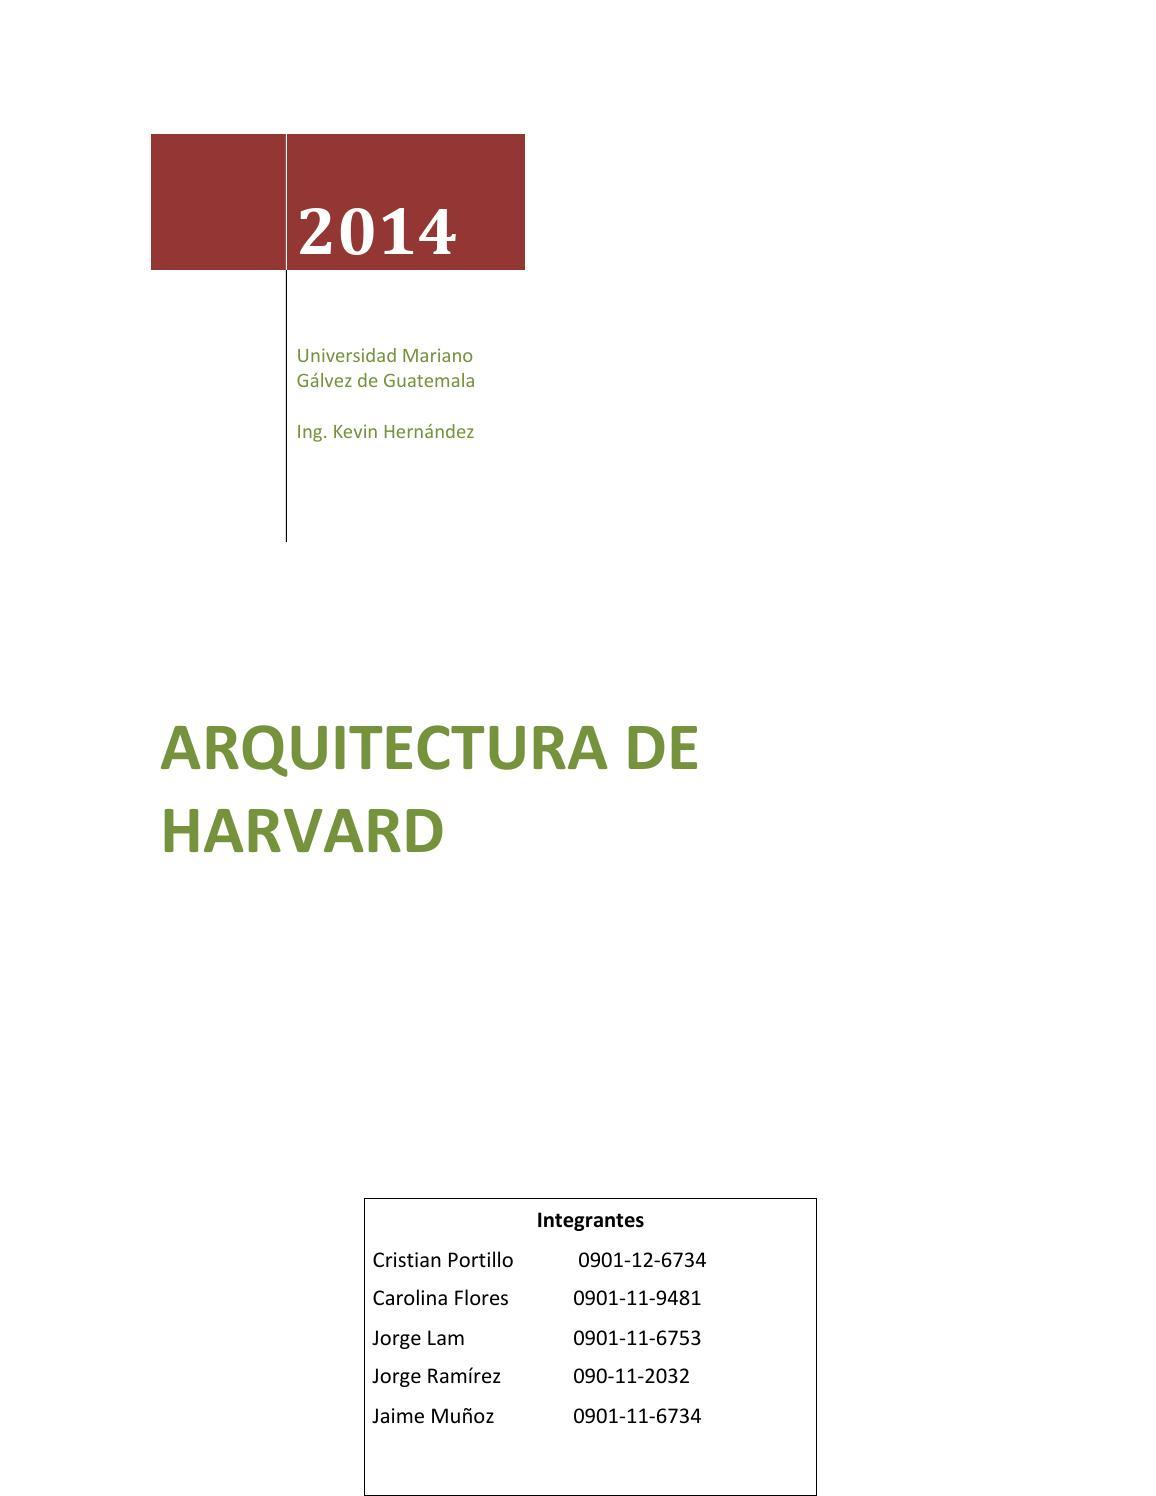 Arquitectura harvard by jaime issuu for Arquitectura harvard